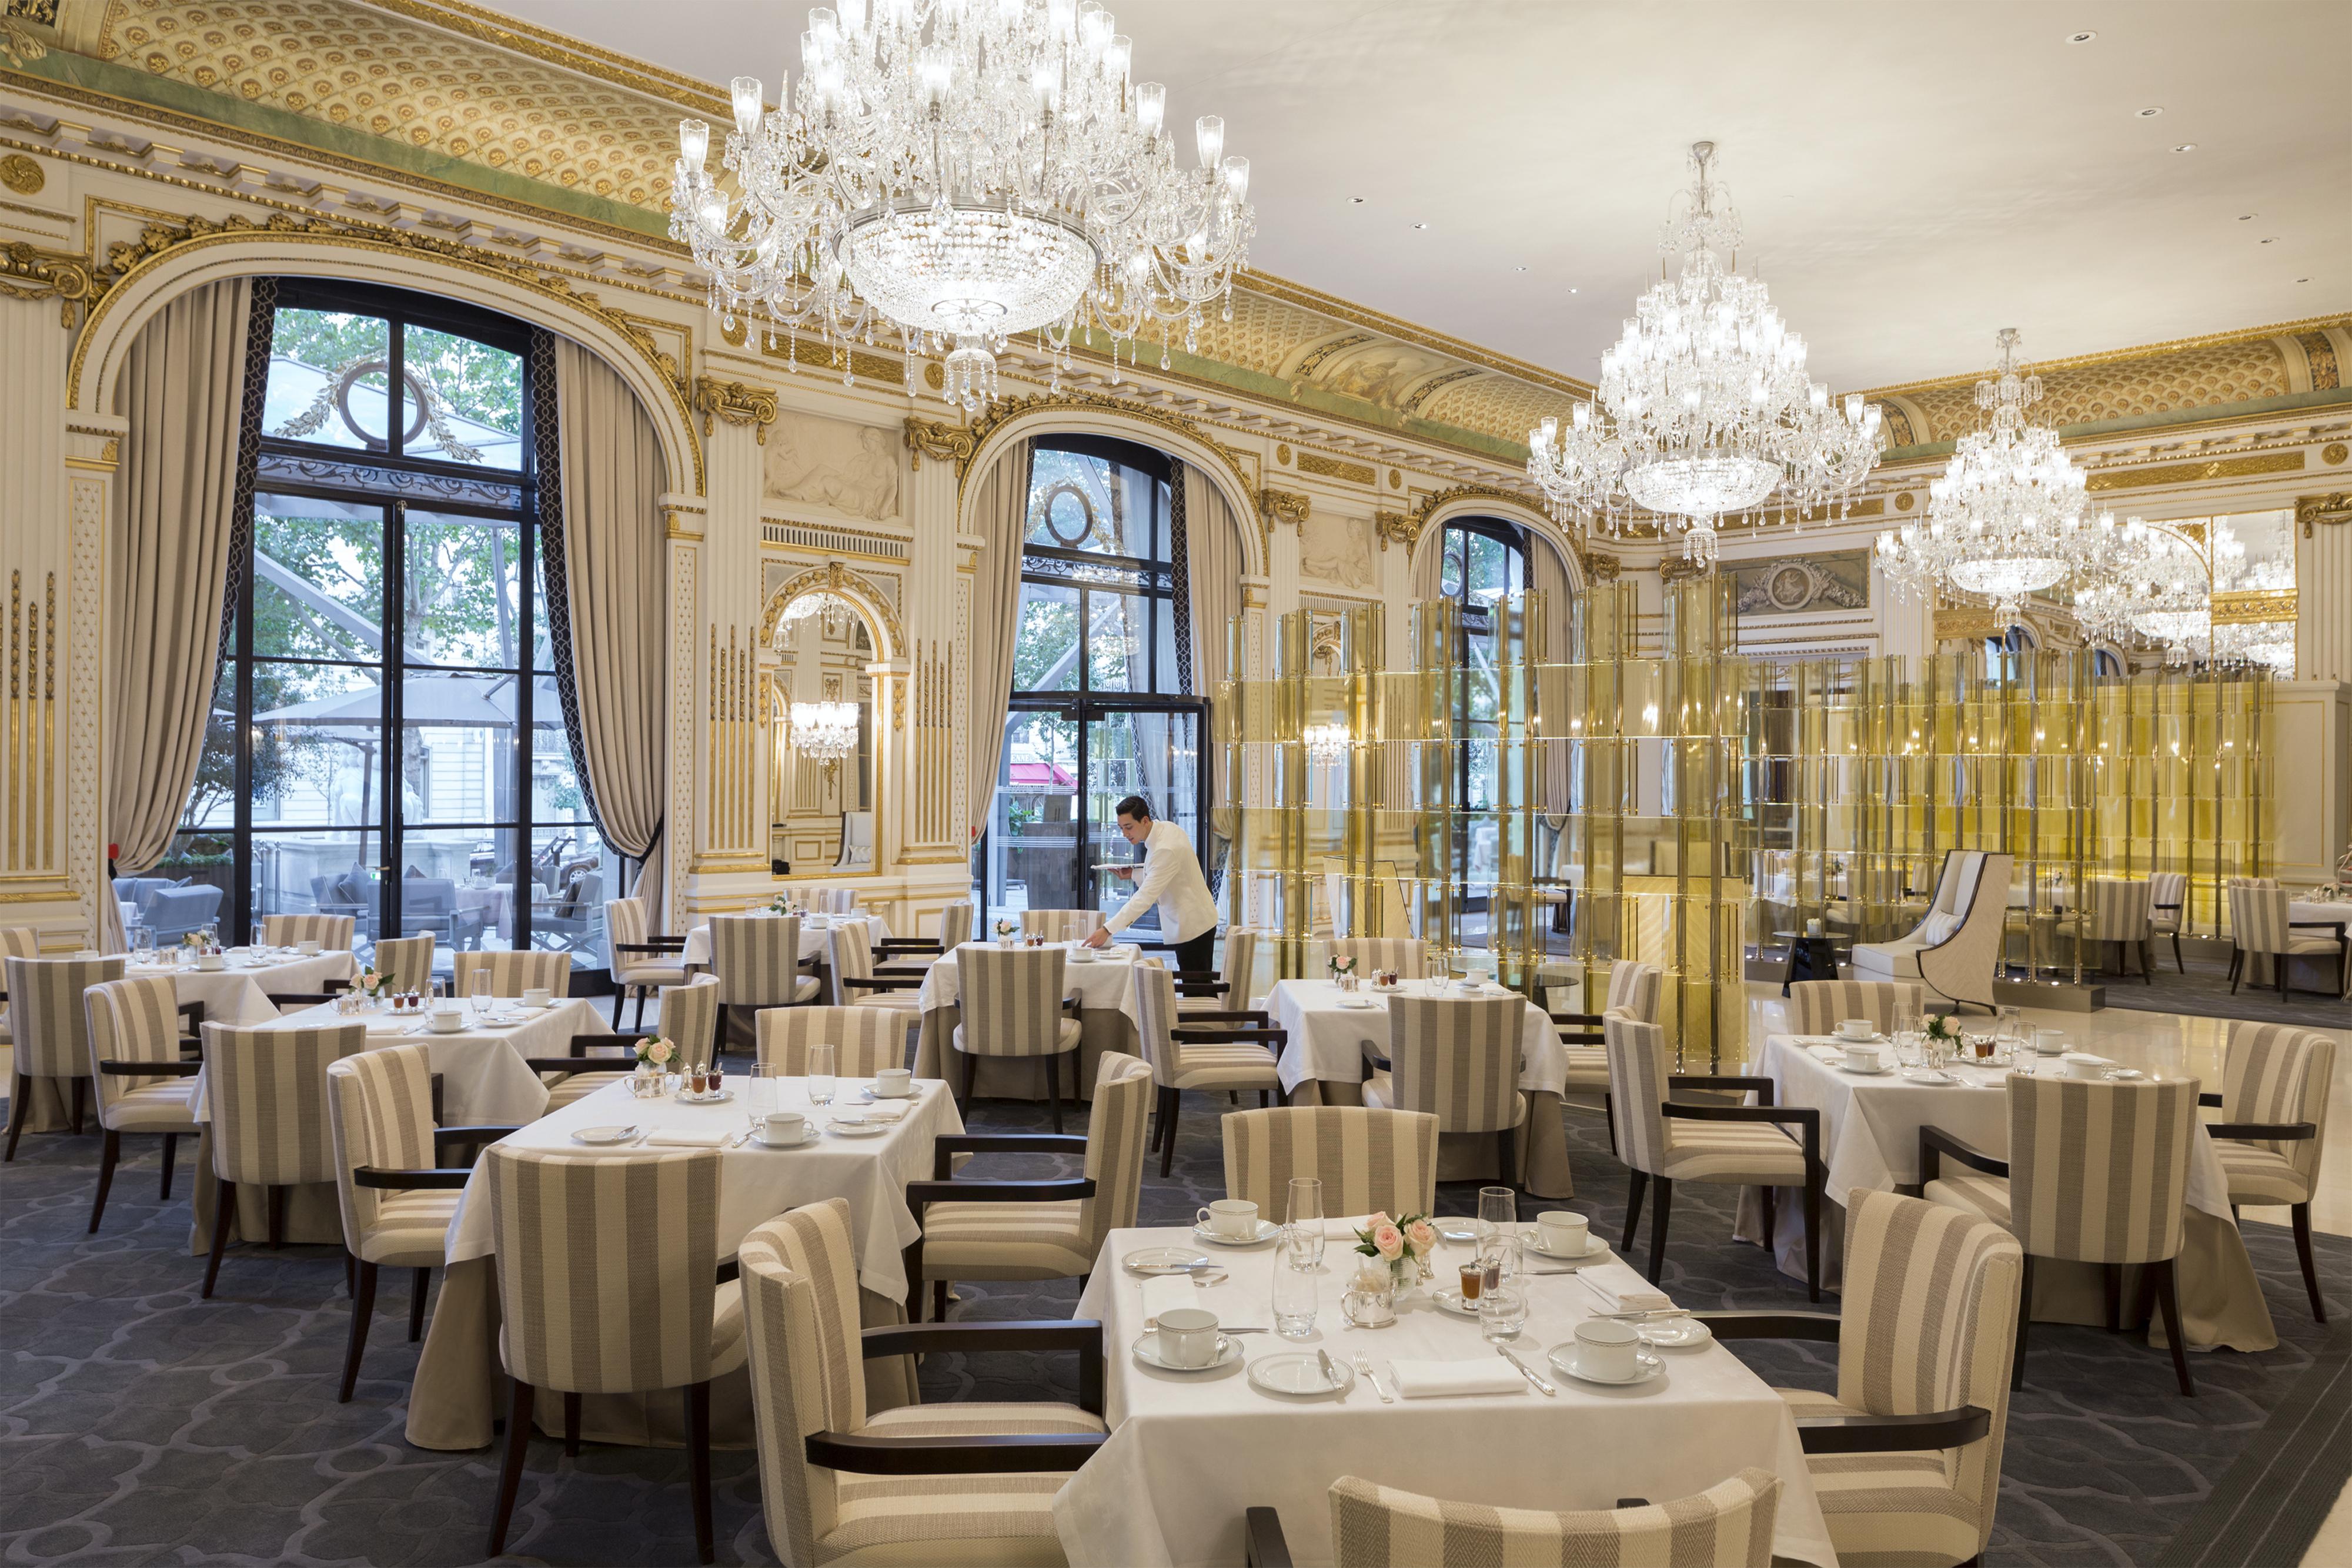 Le Restaurant Hotel Amour